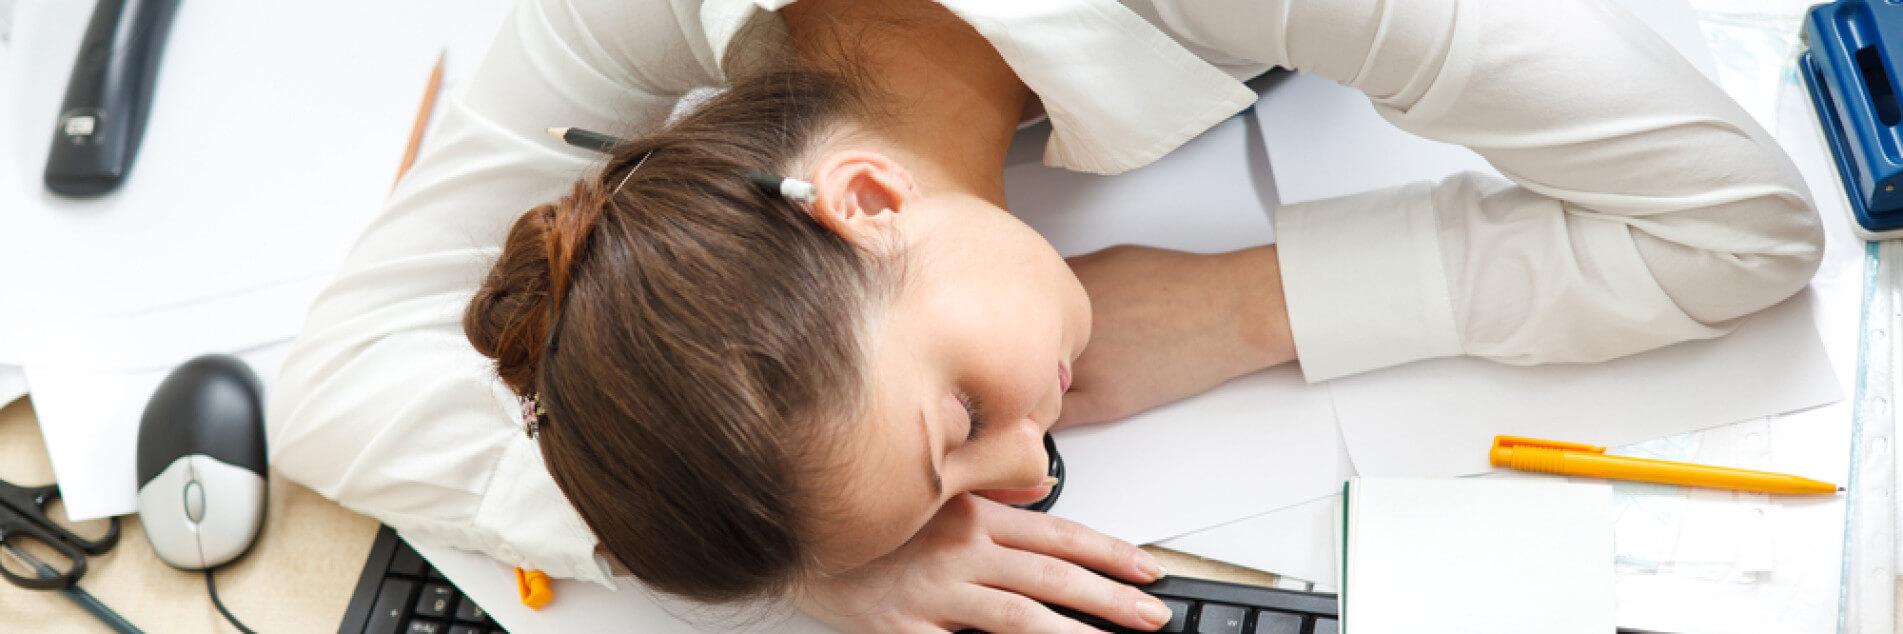 Sleep Apnea, Snoring Solutions & CPAP Alternatives